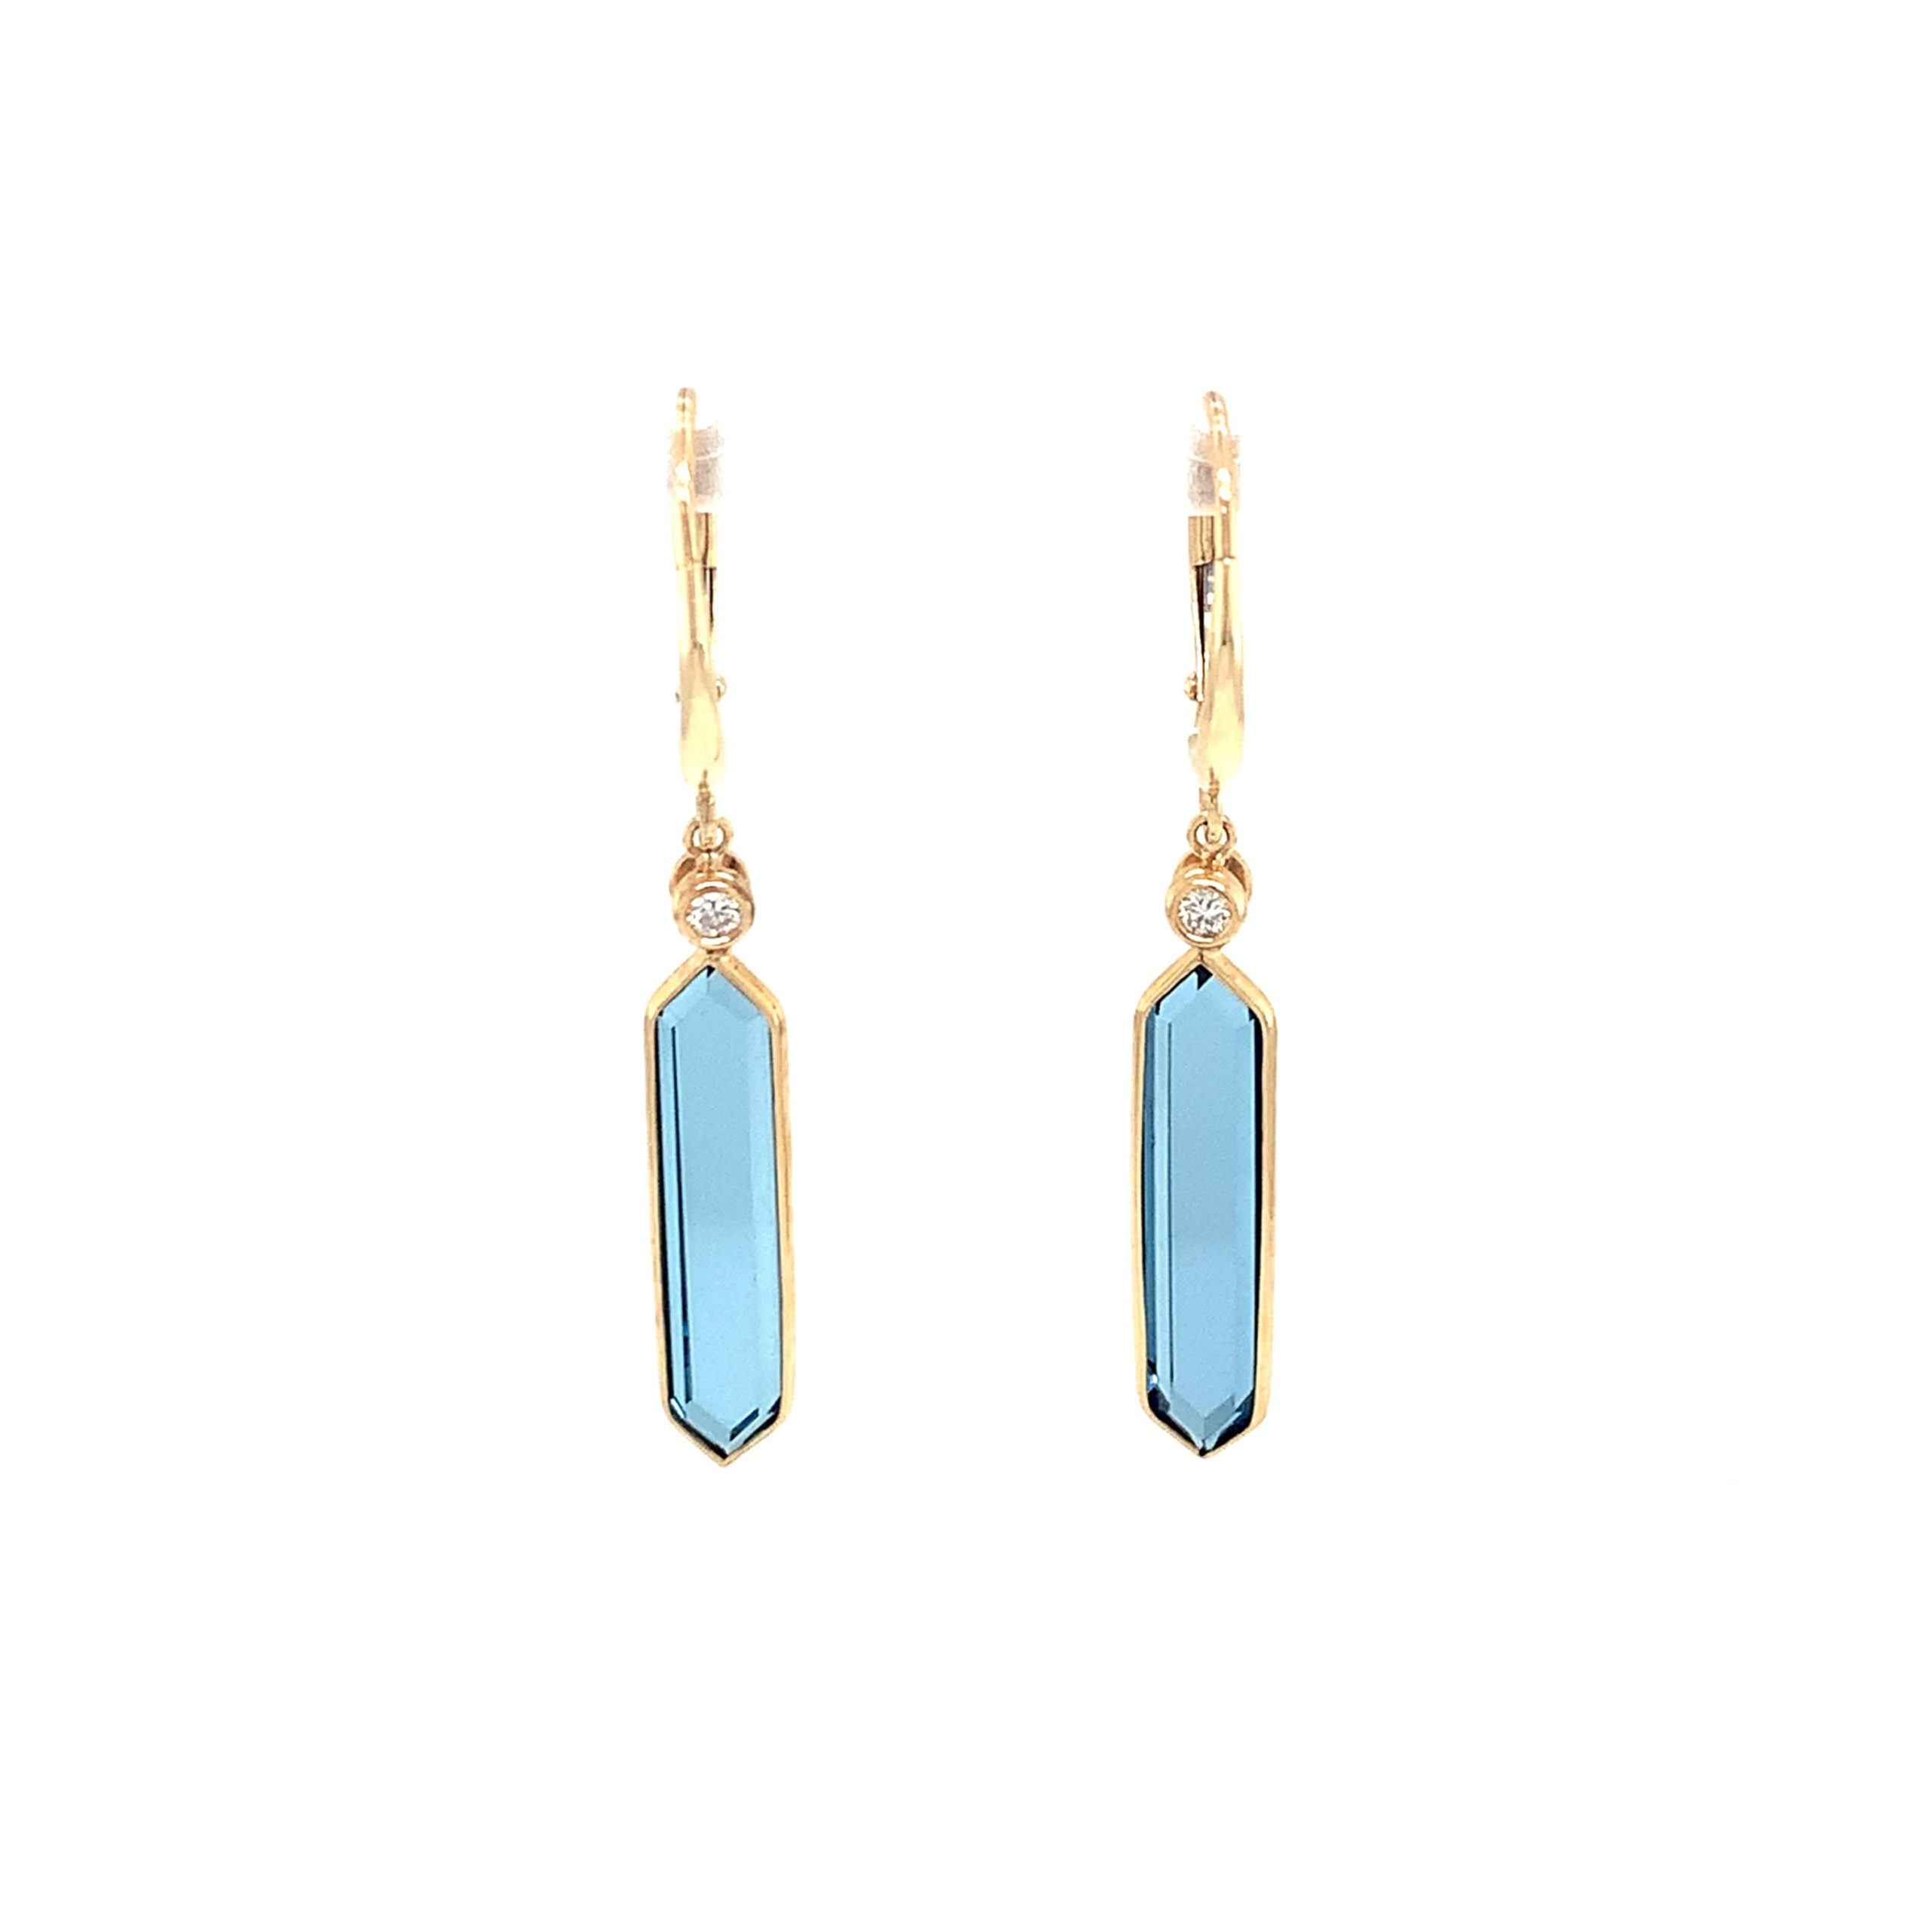 Yellow Gold Hexagonal Blue Topaz Earrings